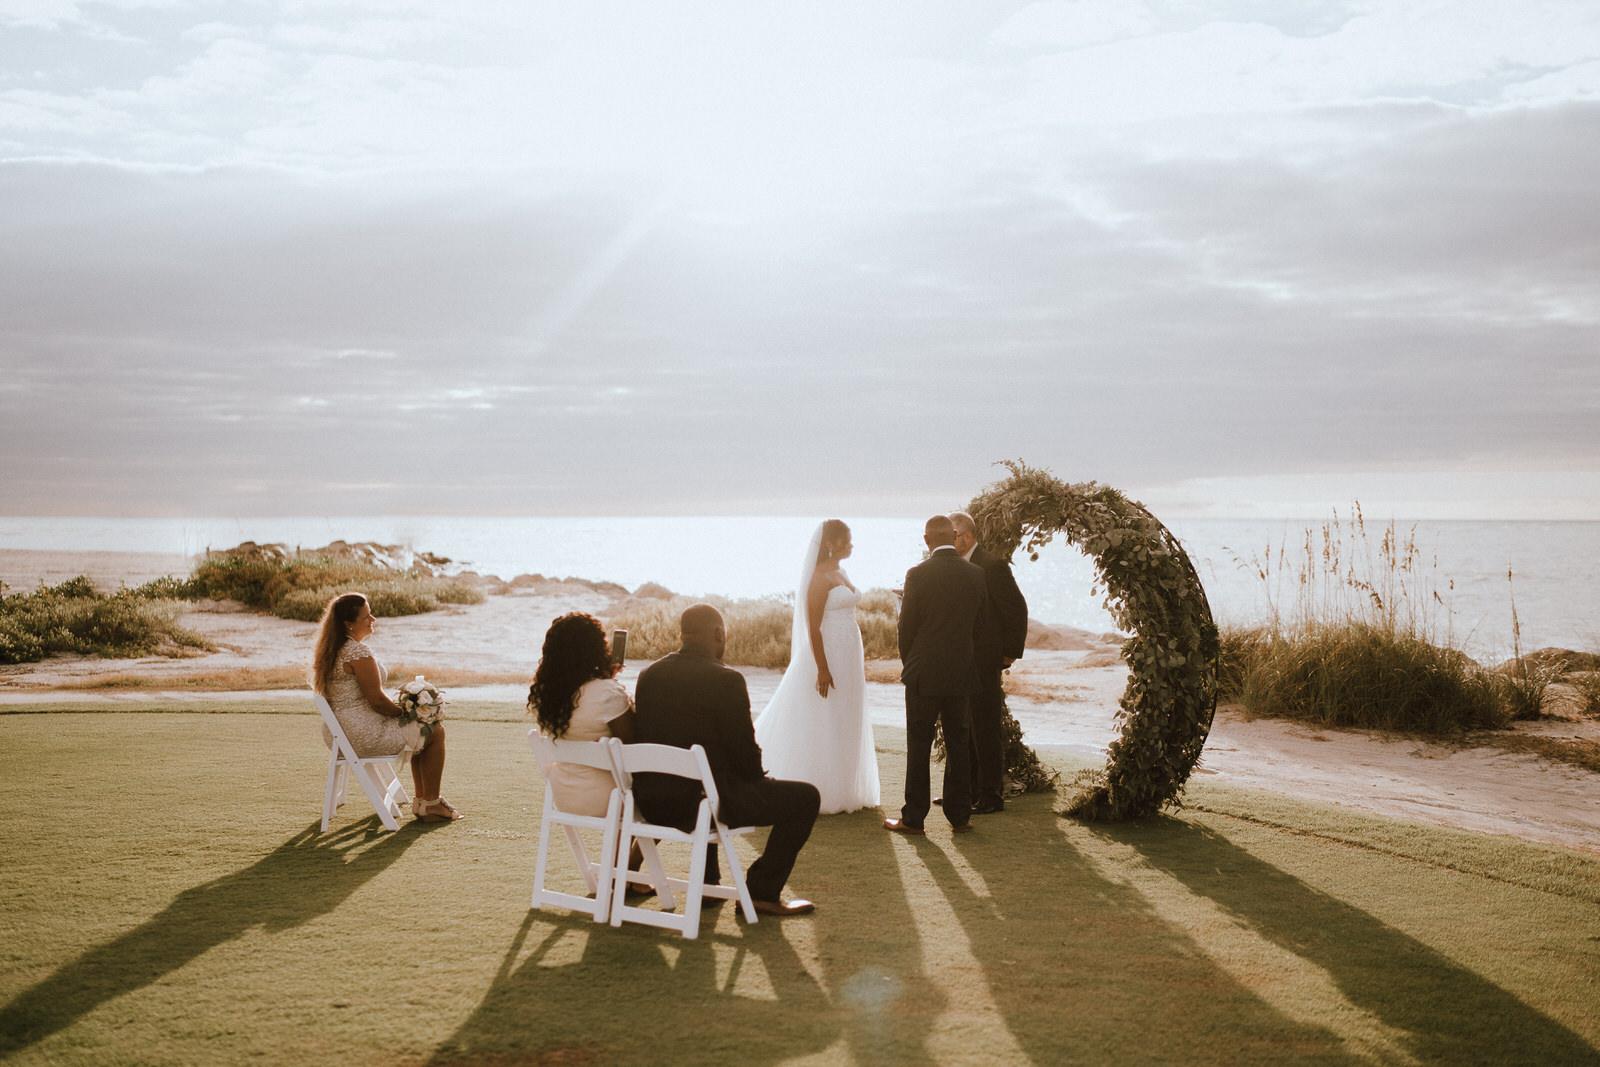 South Seas Island Resort Elopement- Alyana and Shawn- Michelle Gonzalez Photography-443.JPG